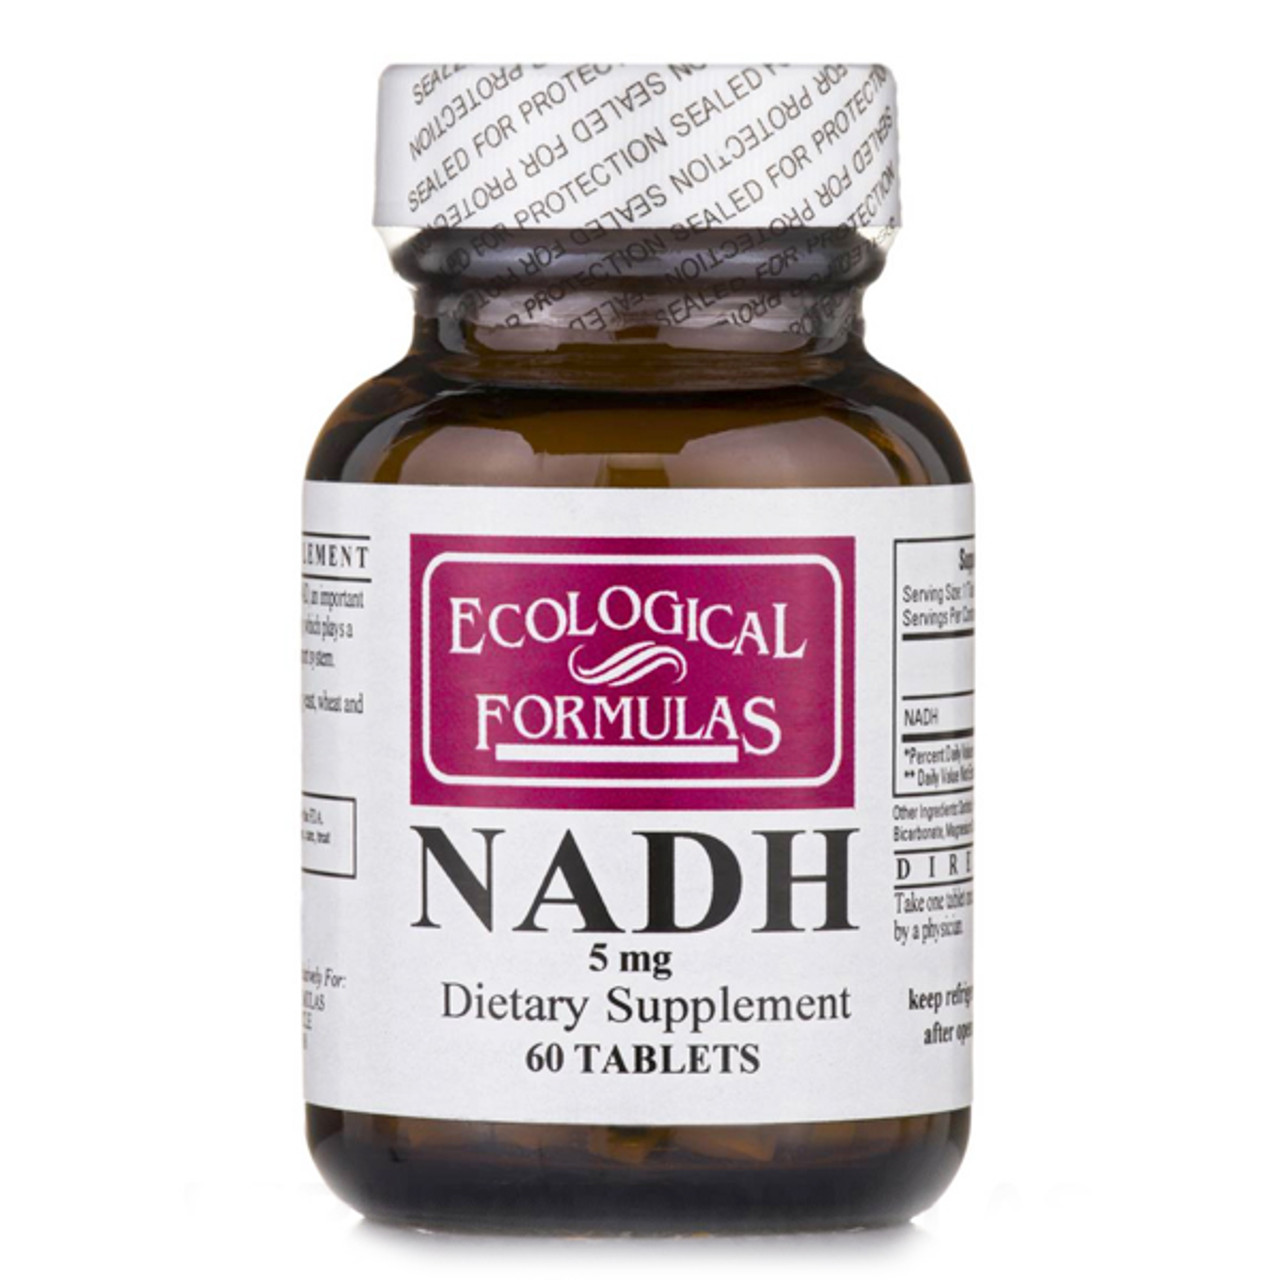 NADH 60 Tabs (5 mg)